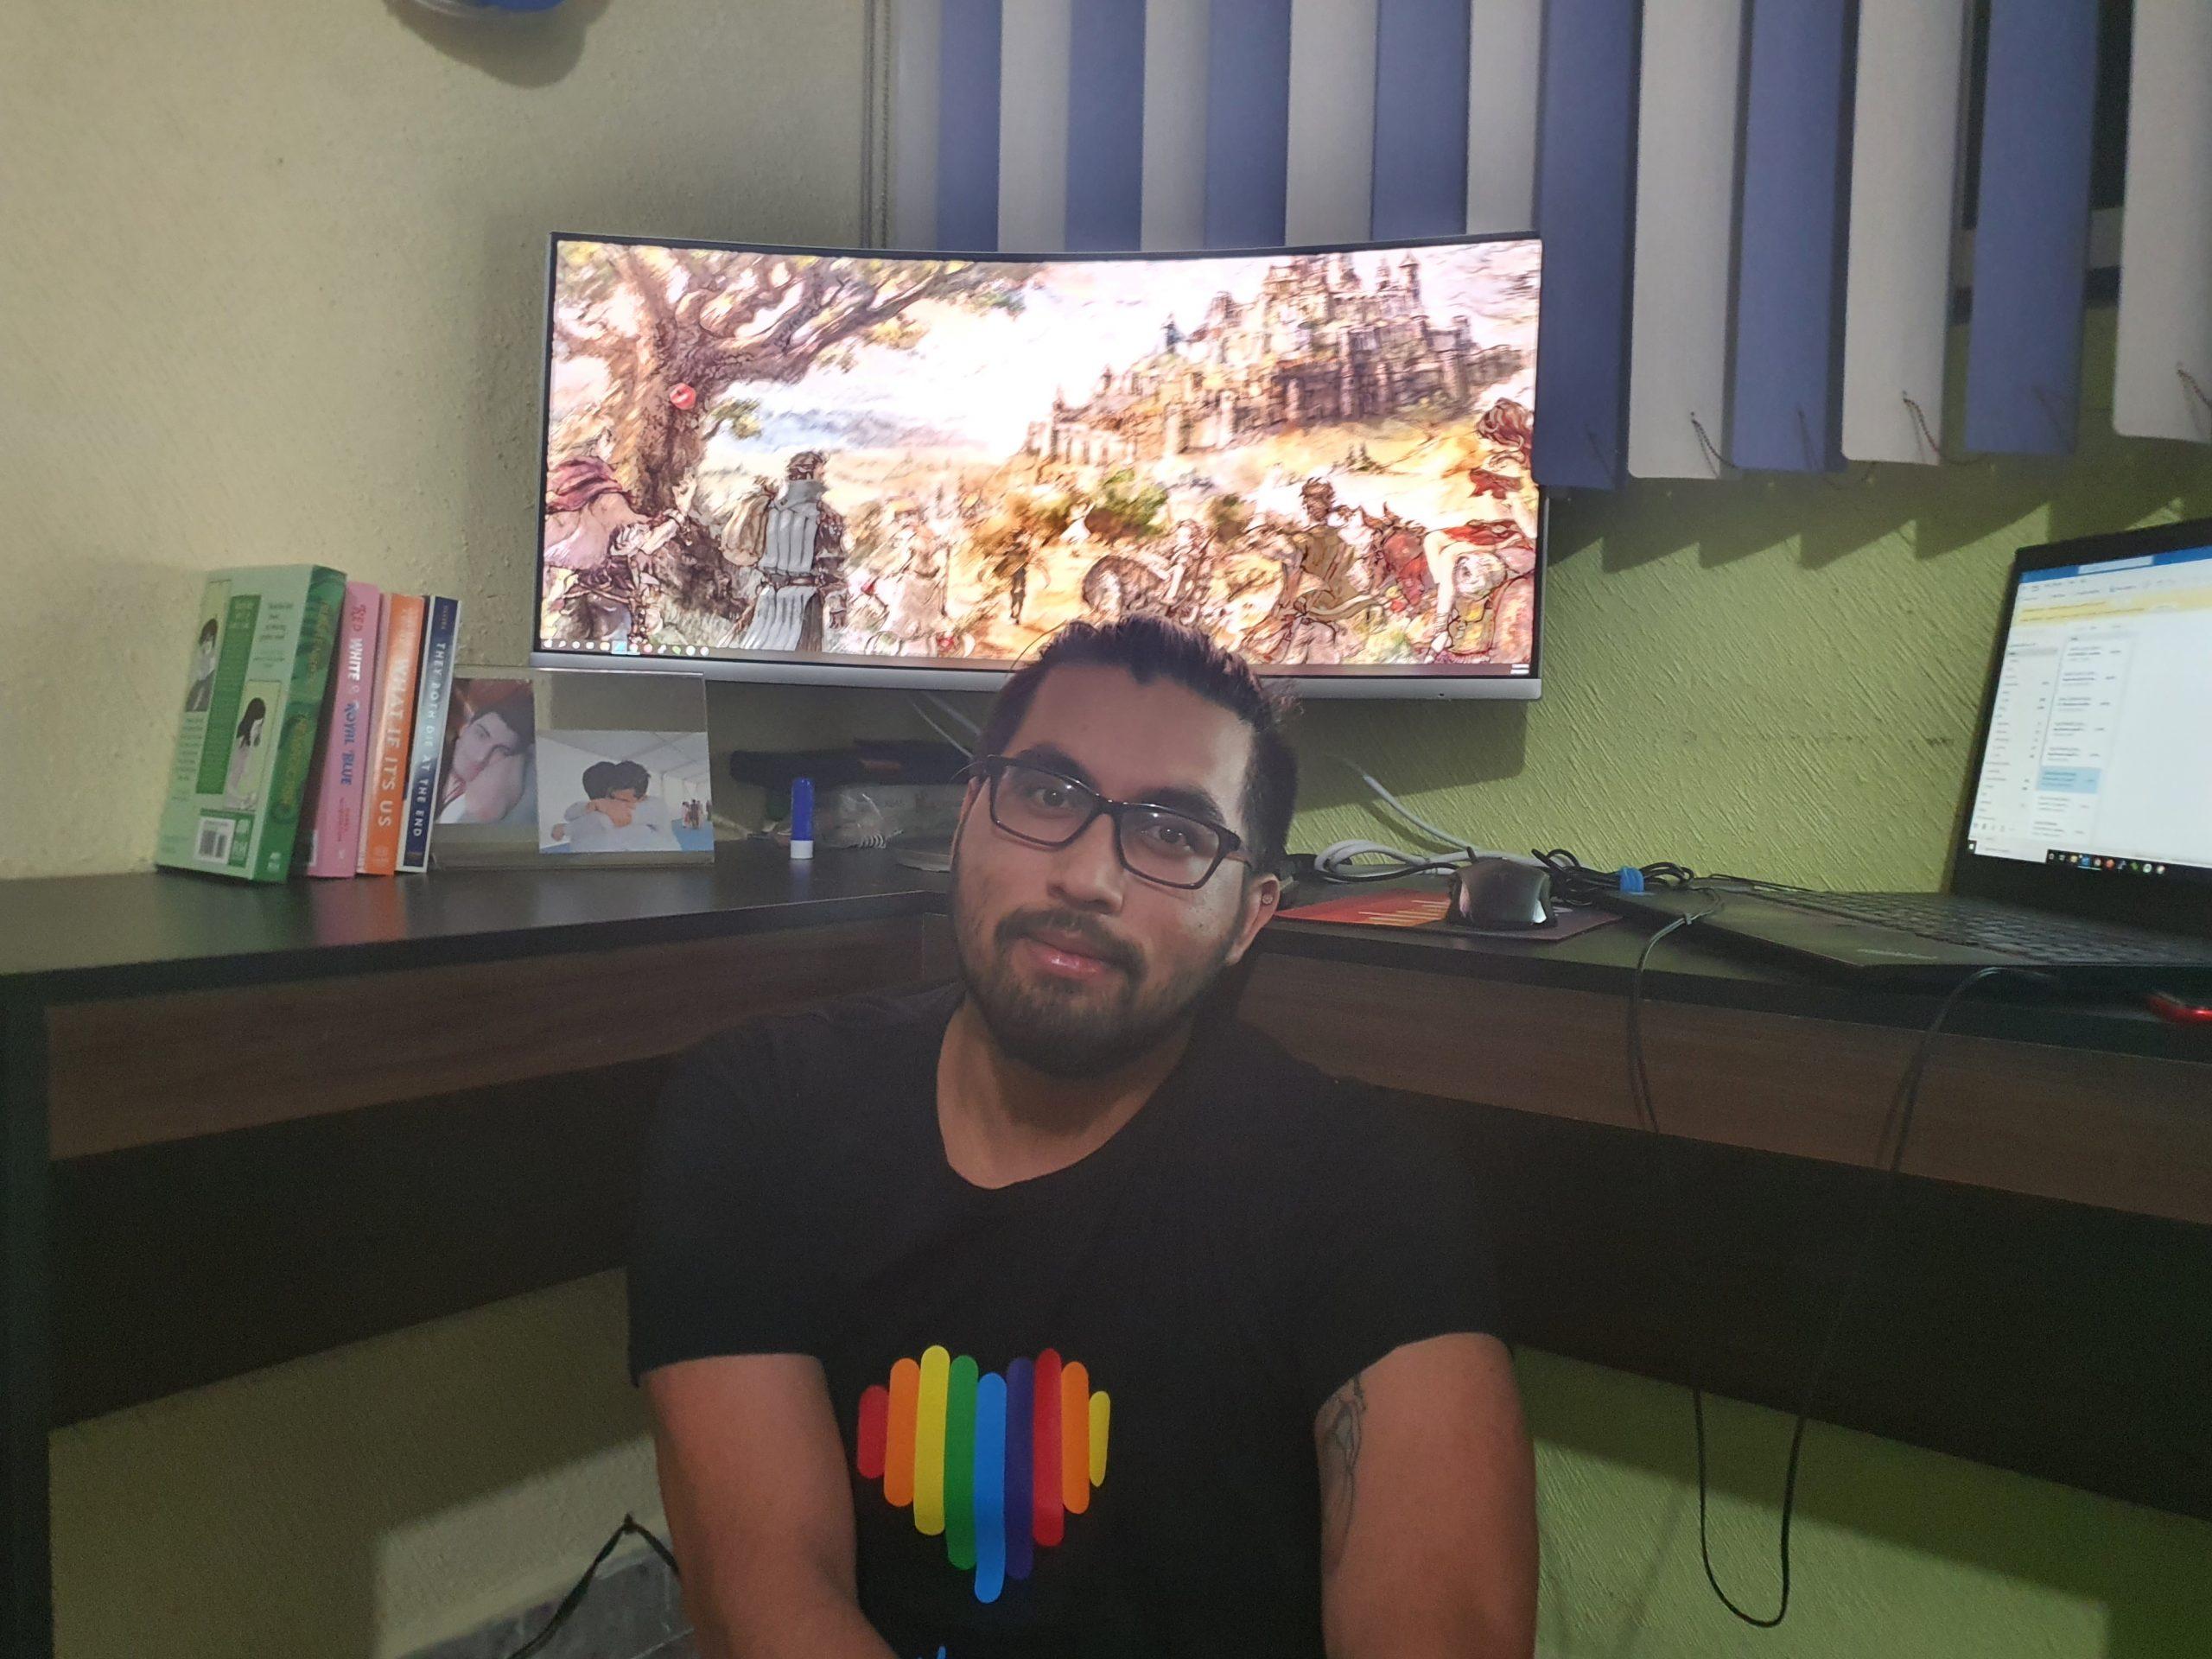 Jesus sitting in front of computer in pride shirt